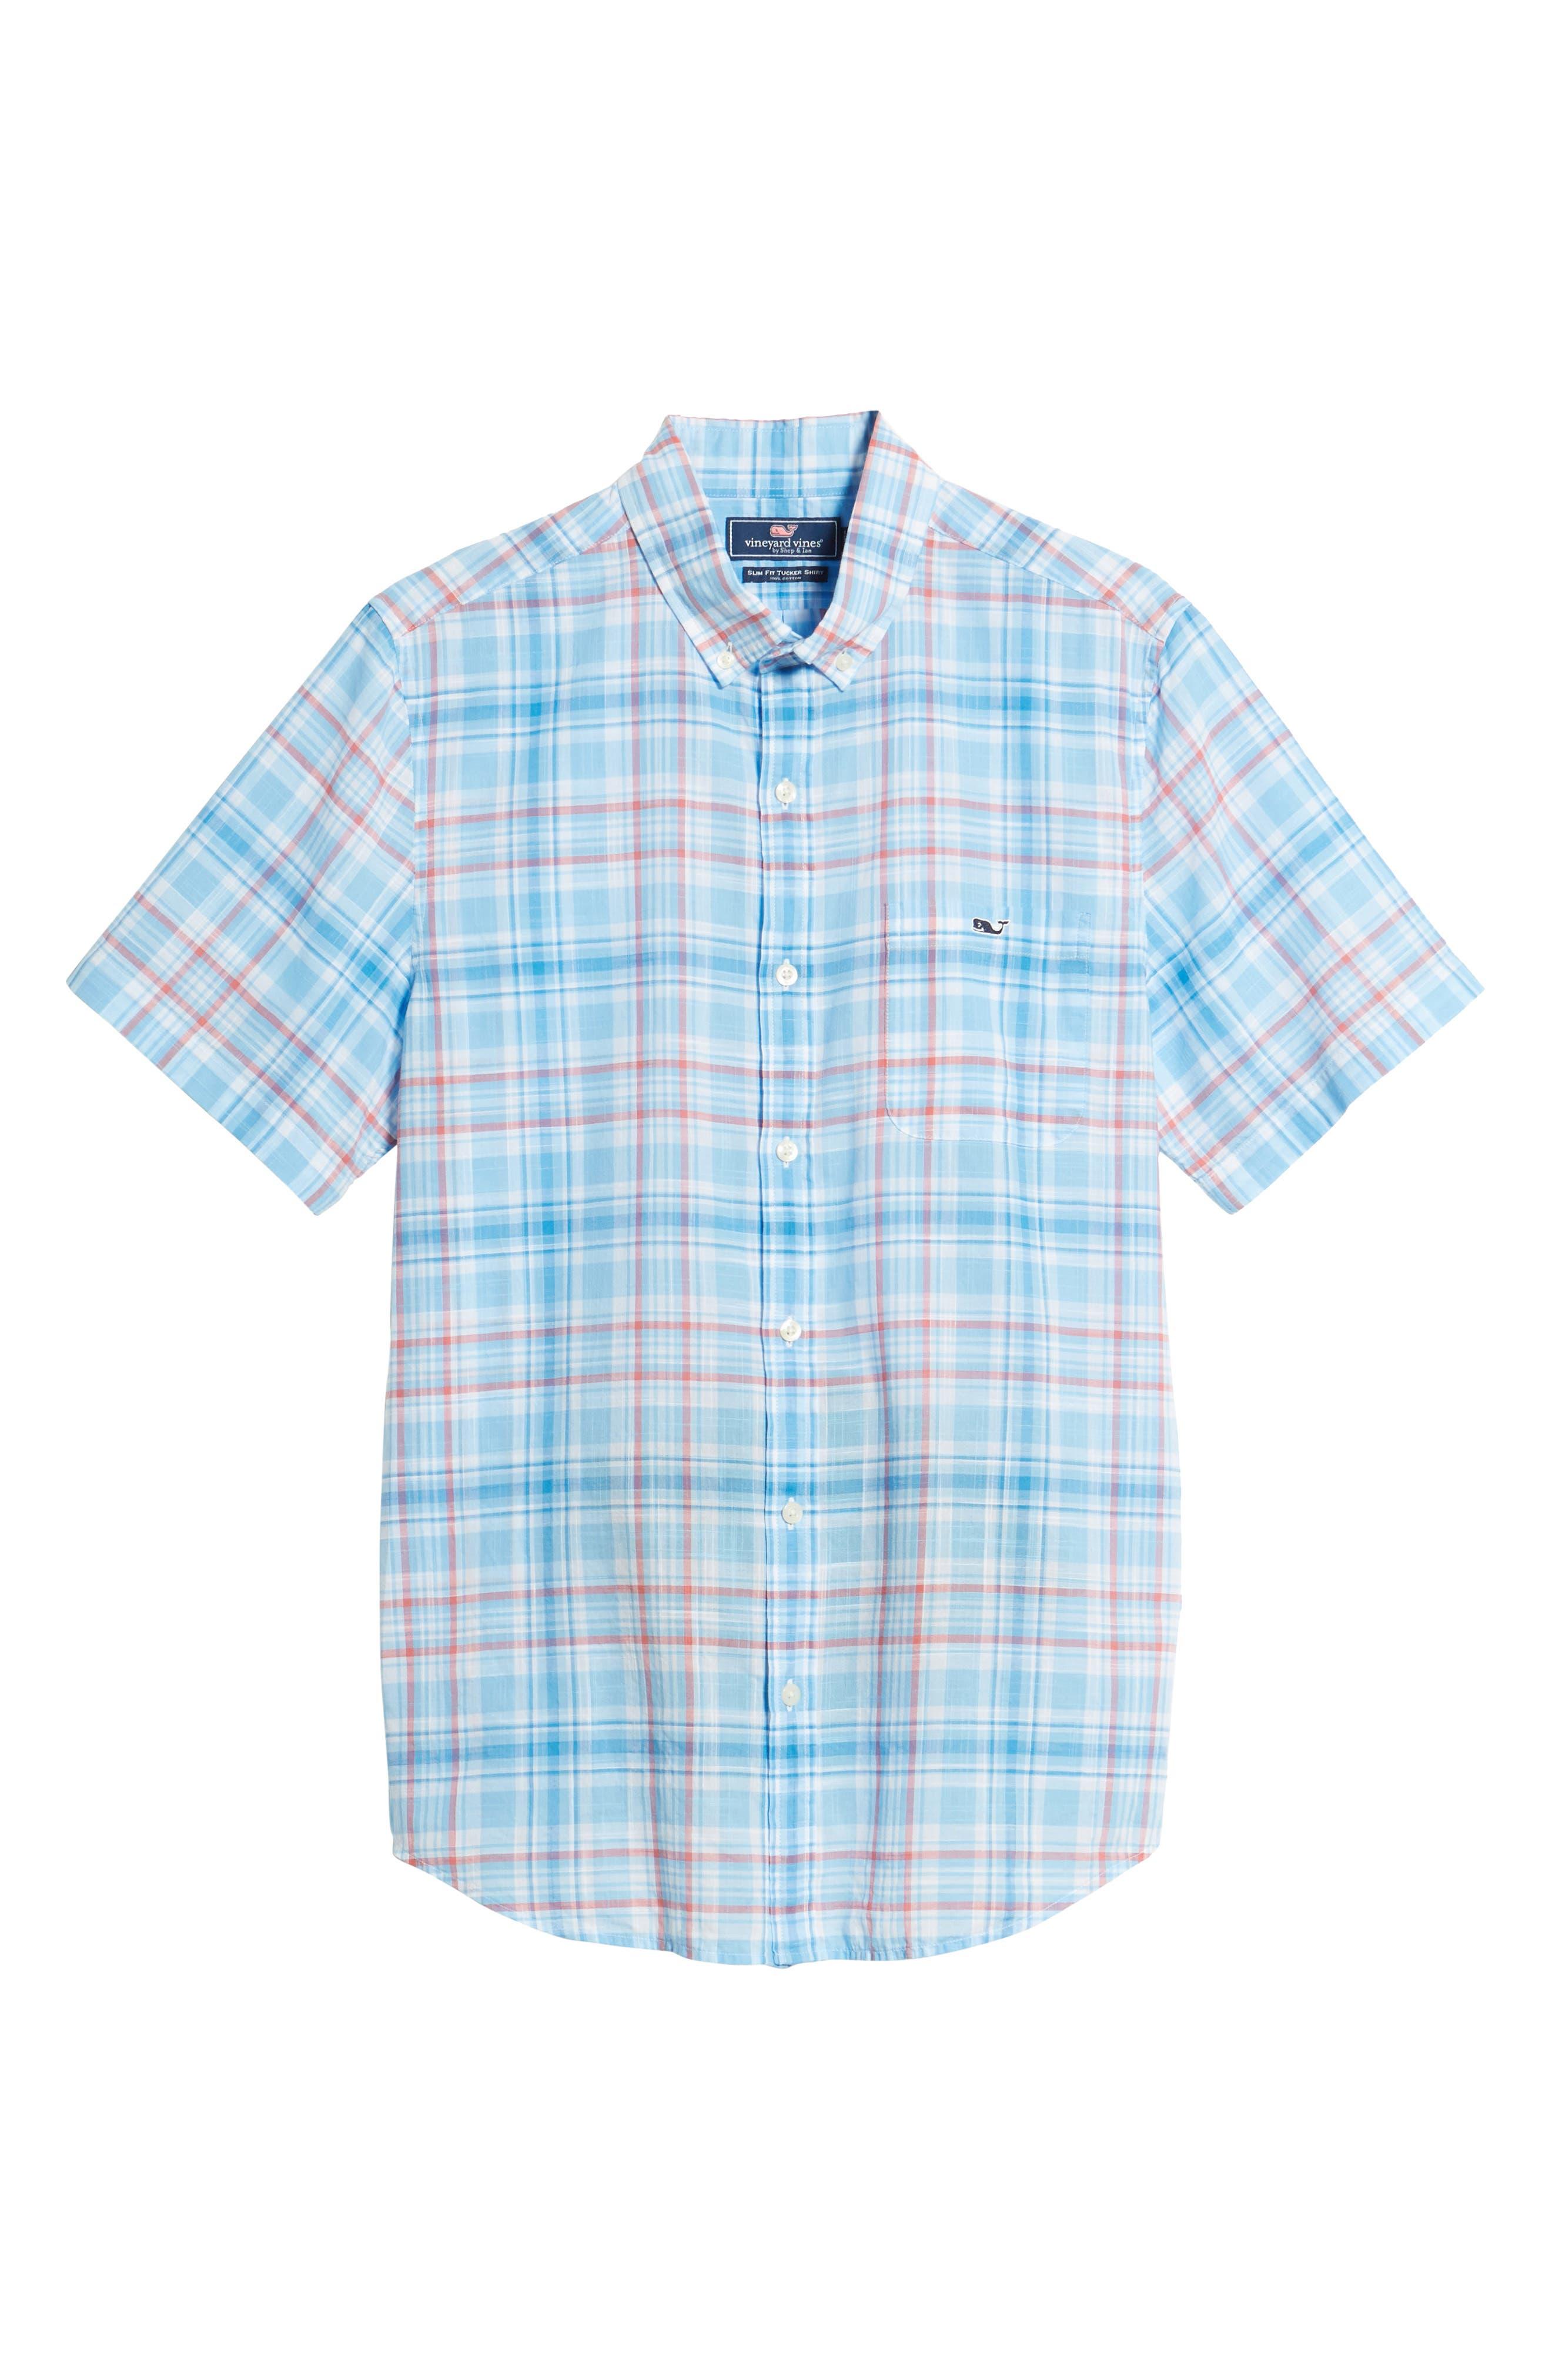 Fire Road Tucker Slim Fit Plaid Sport Shirt,                             Alternate thumbnail 6, color,                             484